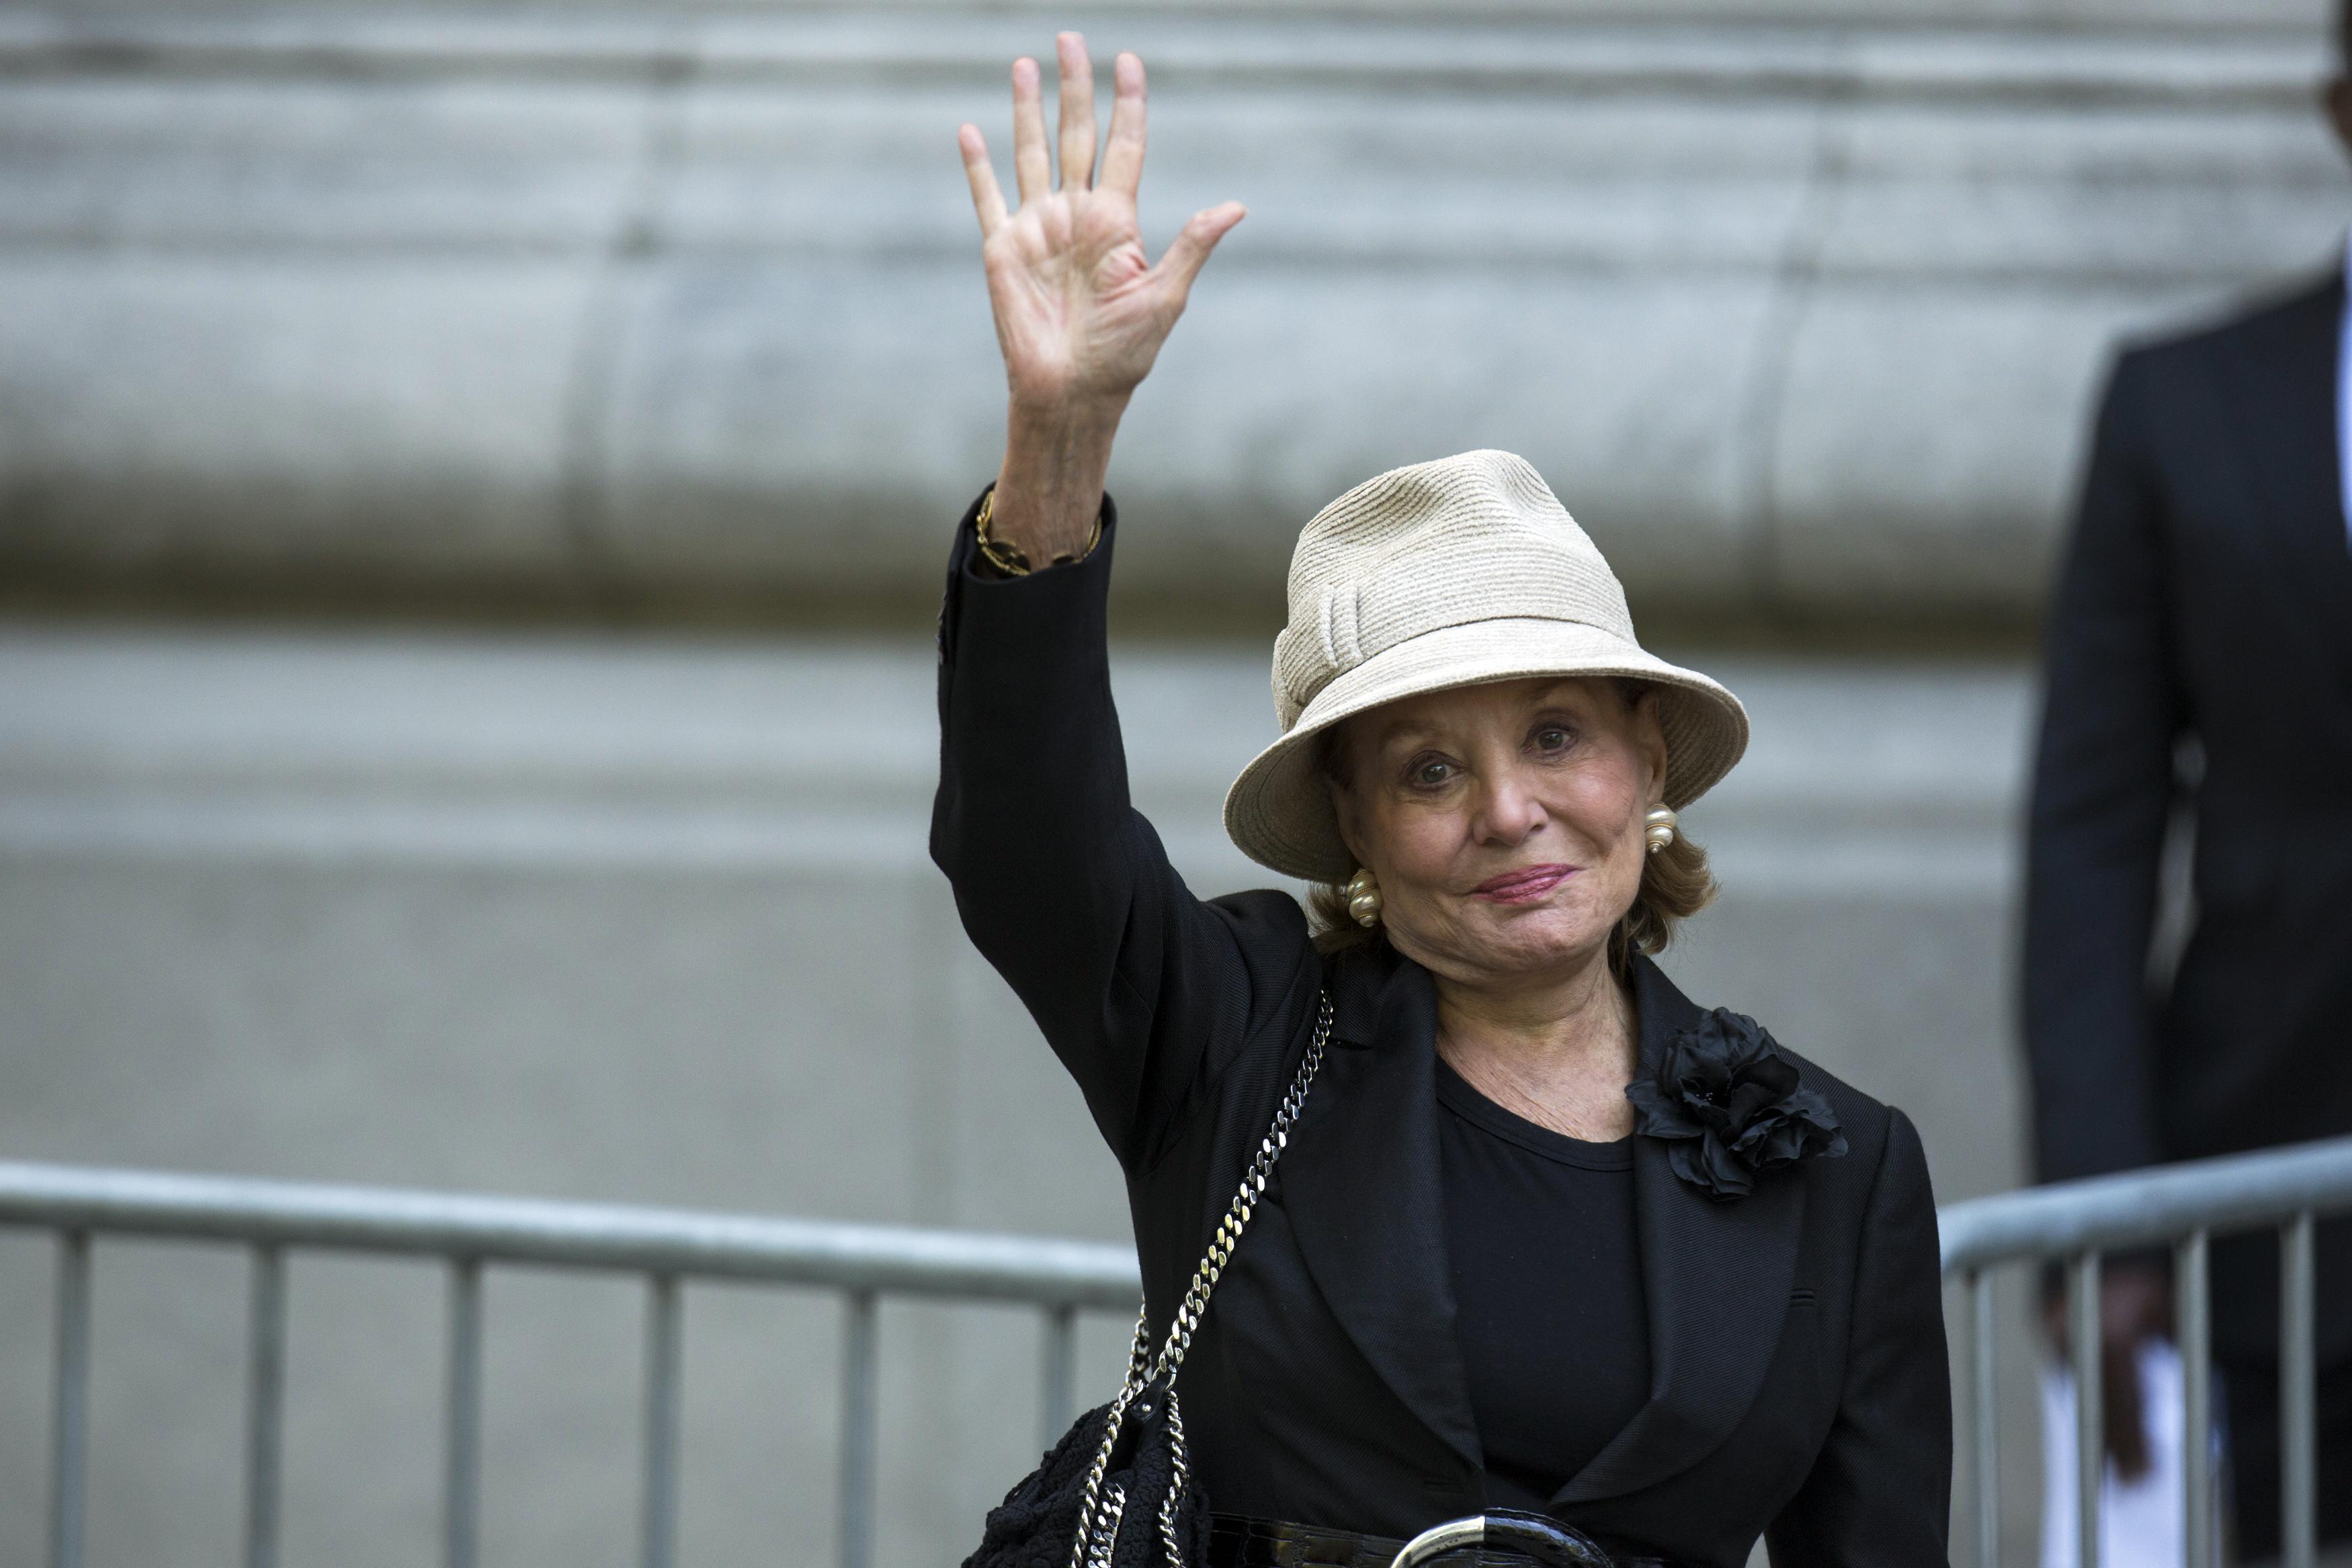 Barbara Walters waving her hand